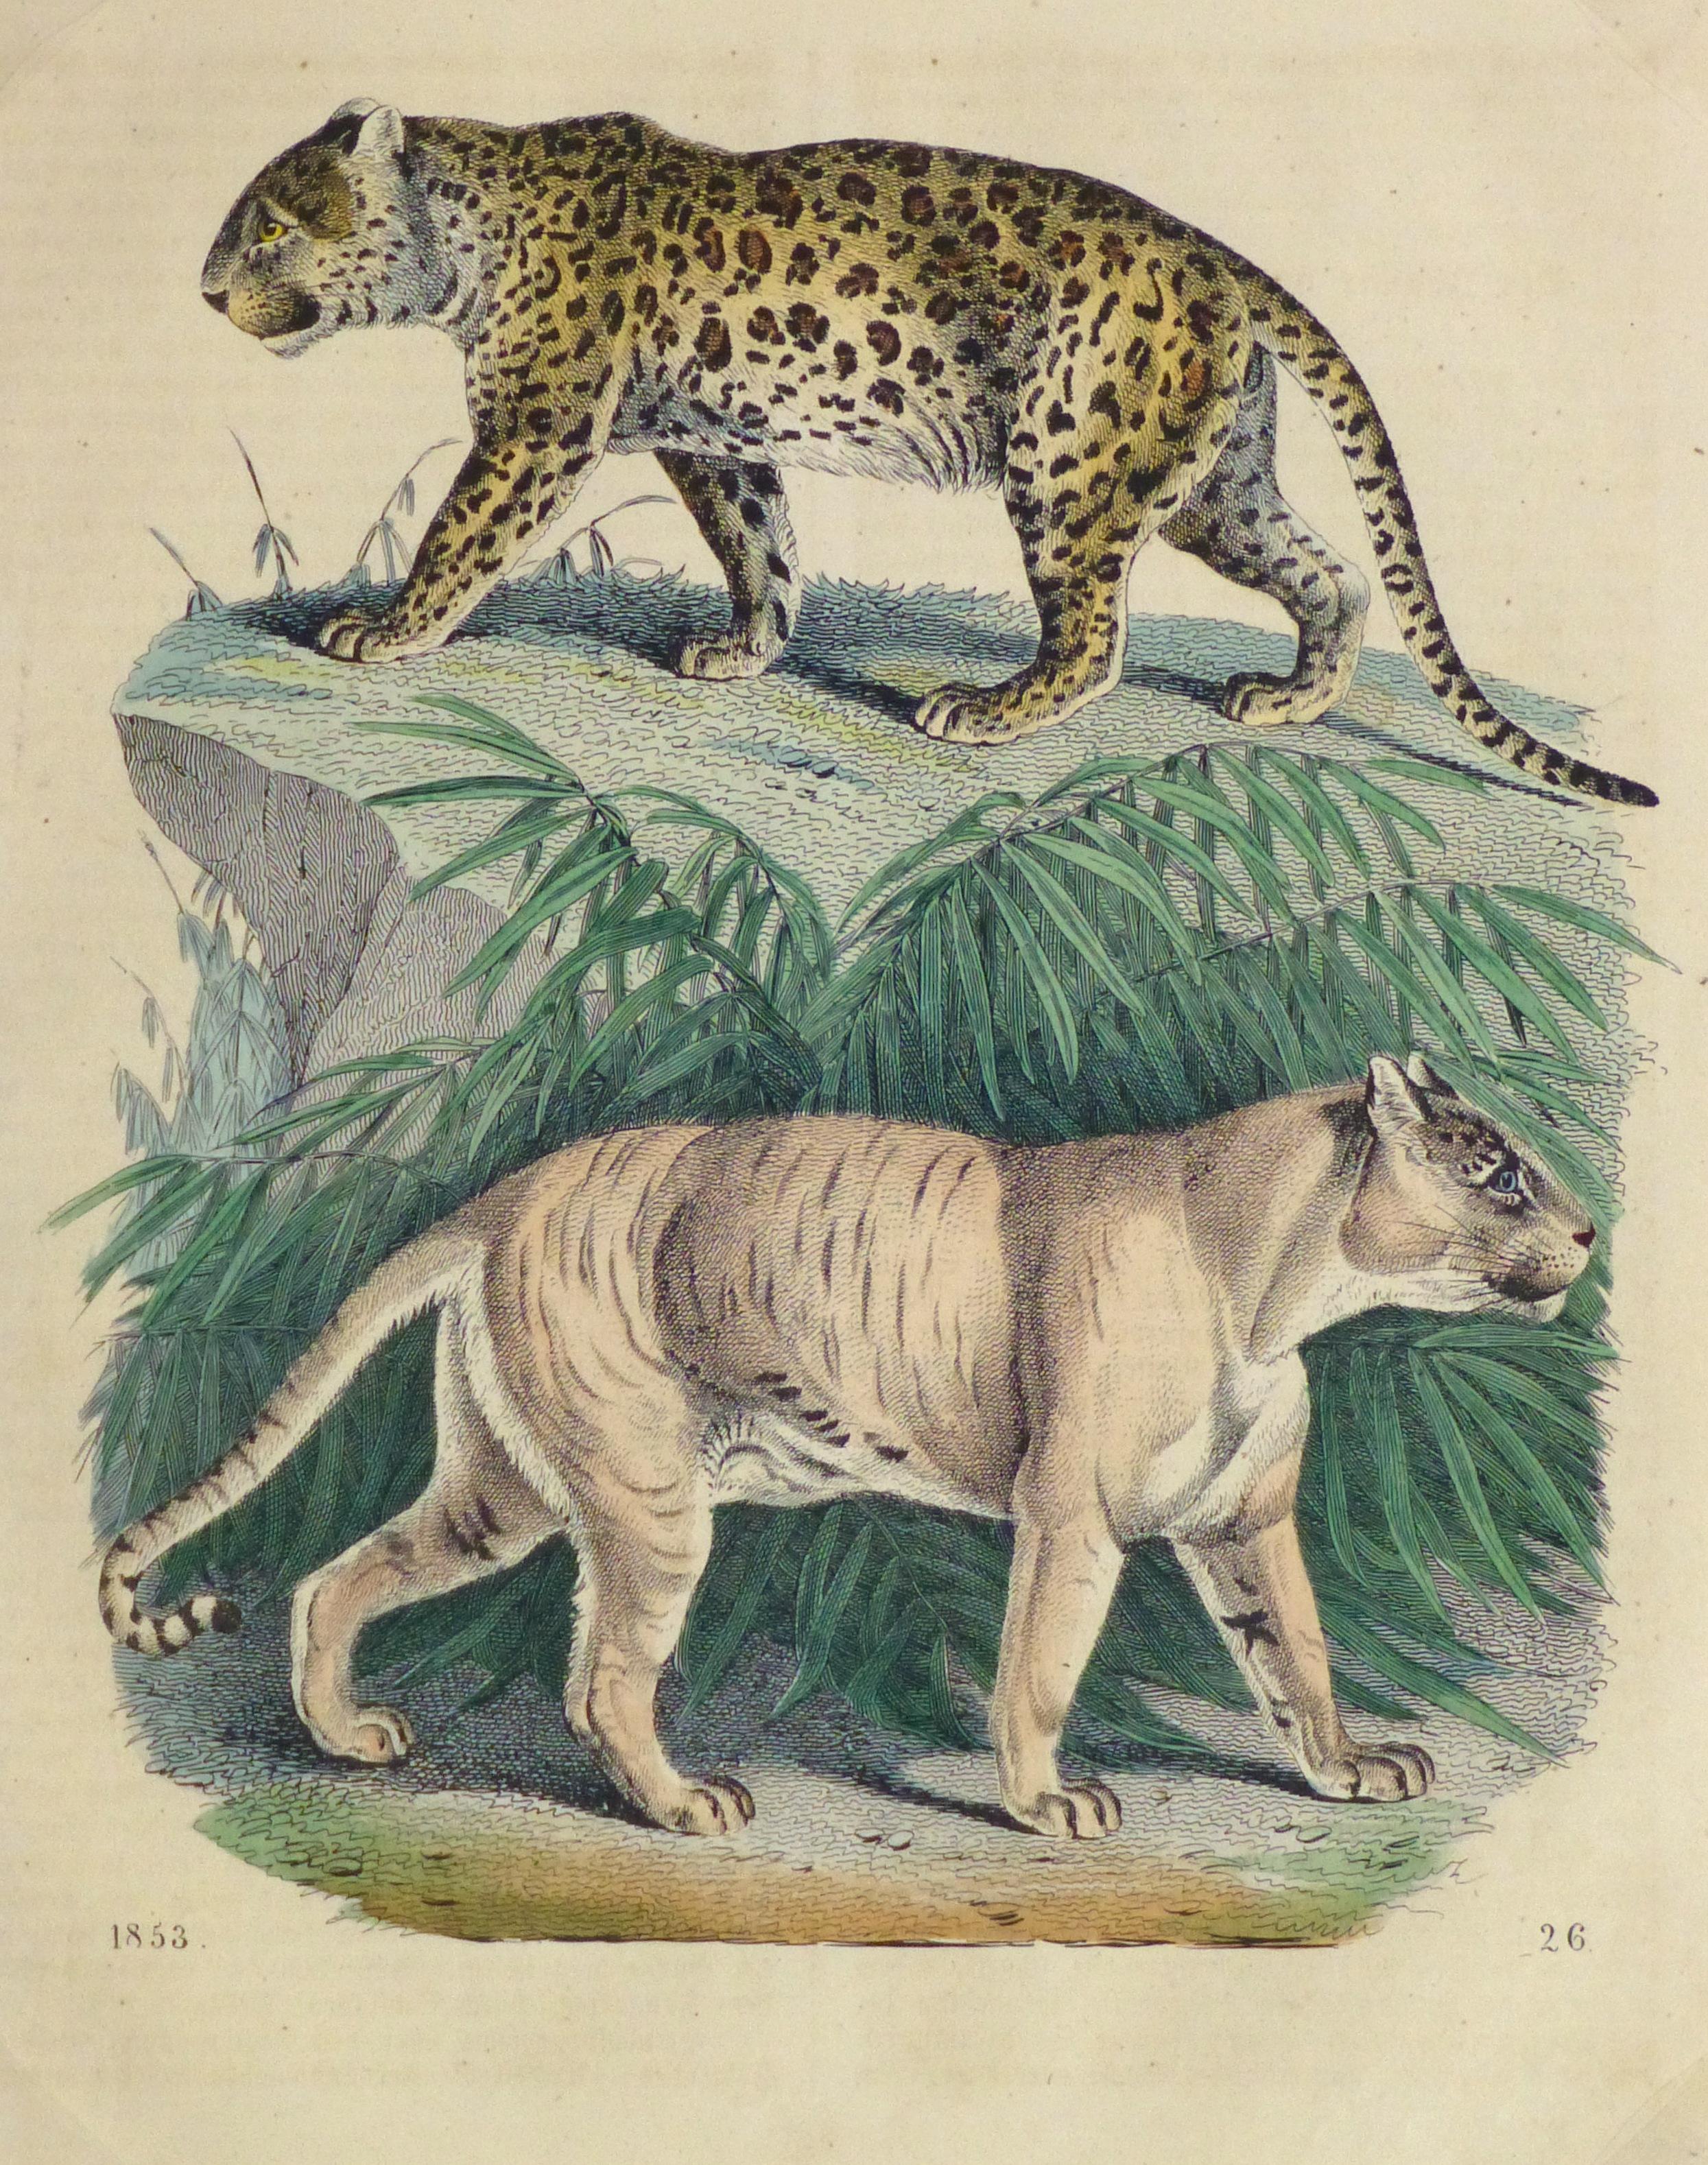 Leopard & Tiger Engraving, 1853-main-10644M